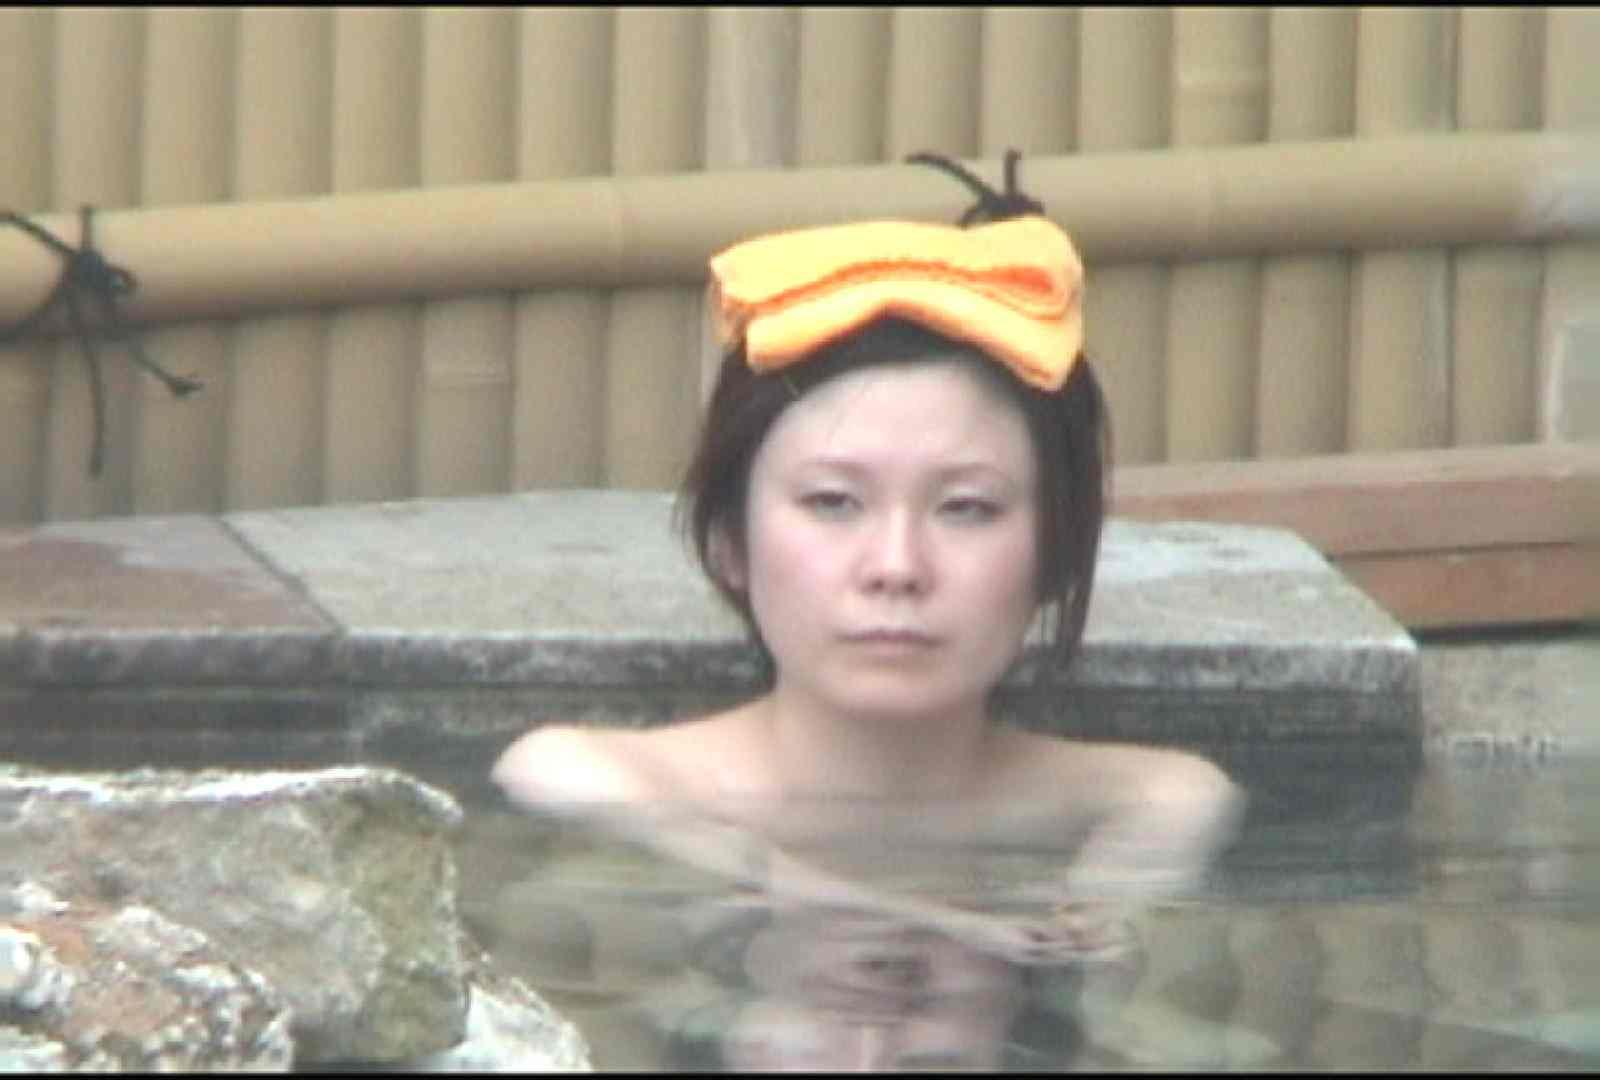 Aquaな露天風呂Vol.177 綺麗なOLたち アダルト動画キャプチャ 112枚 68